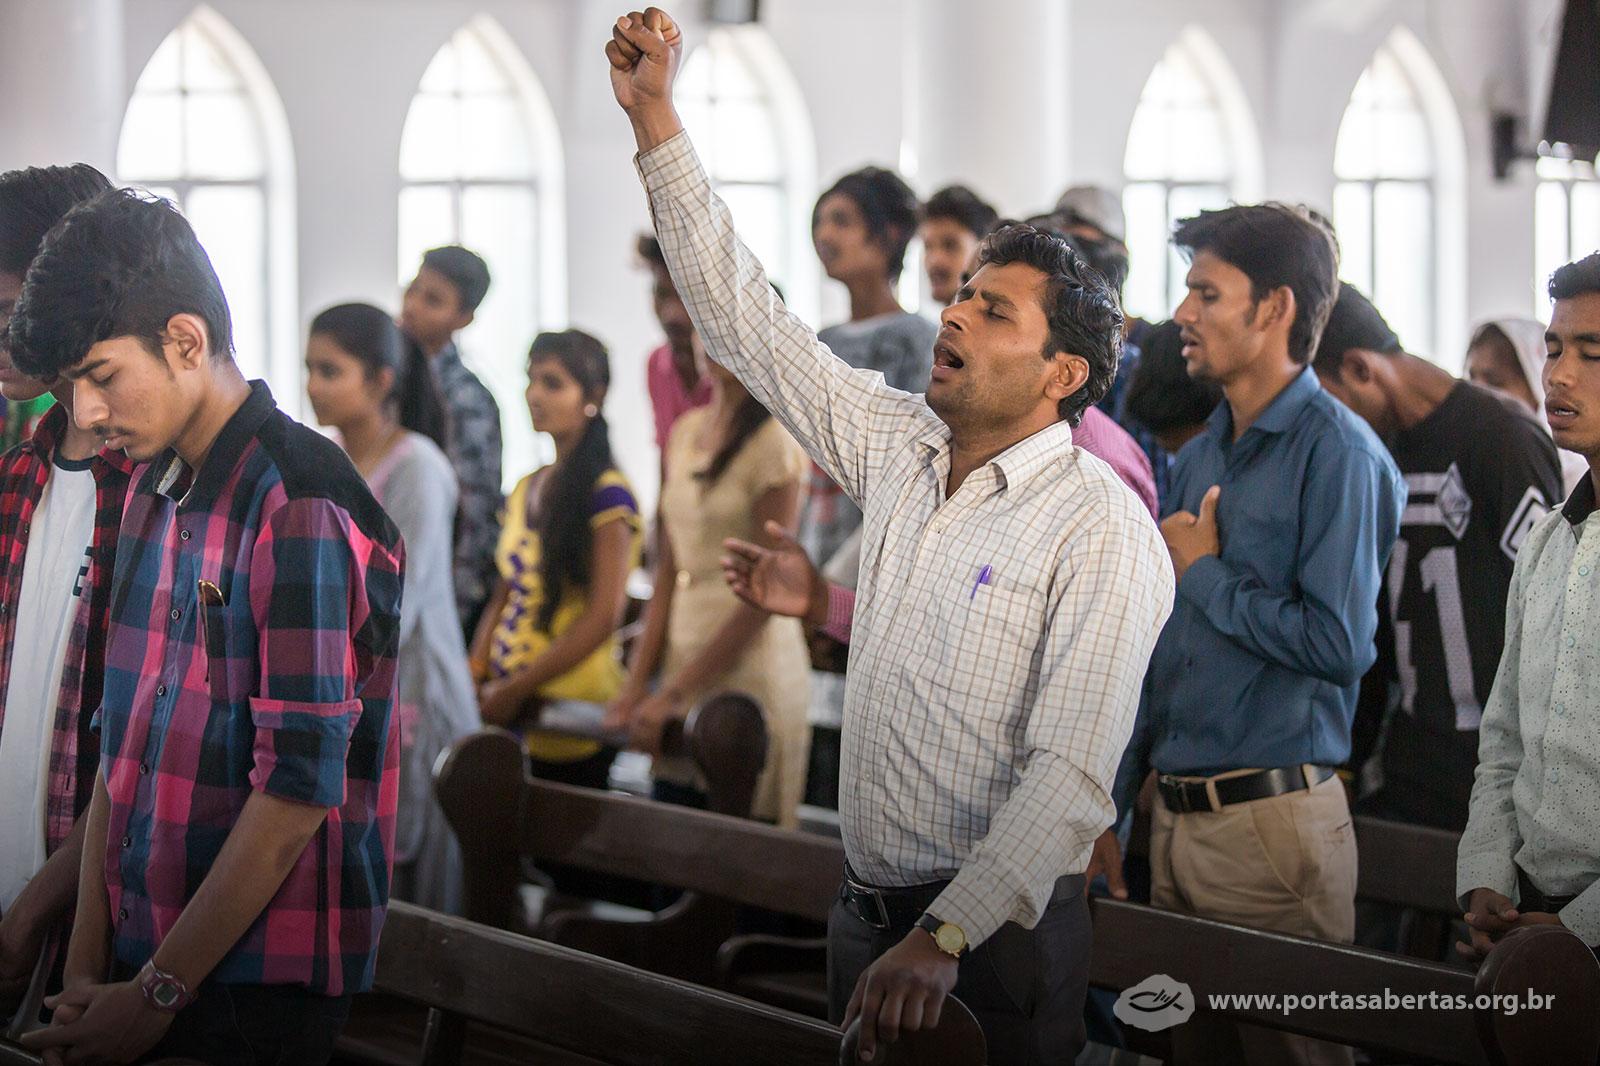 Crist Os S O Uma Amea A Para A Unidade Do Pa S Diz